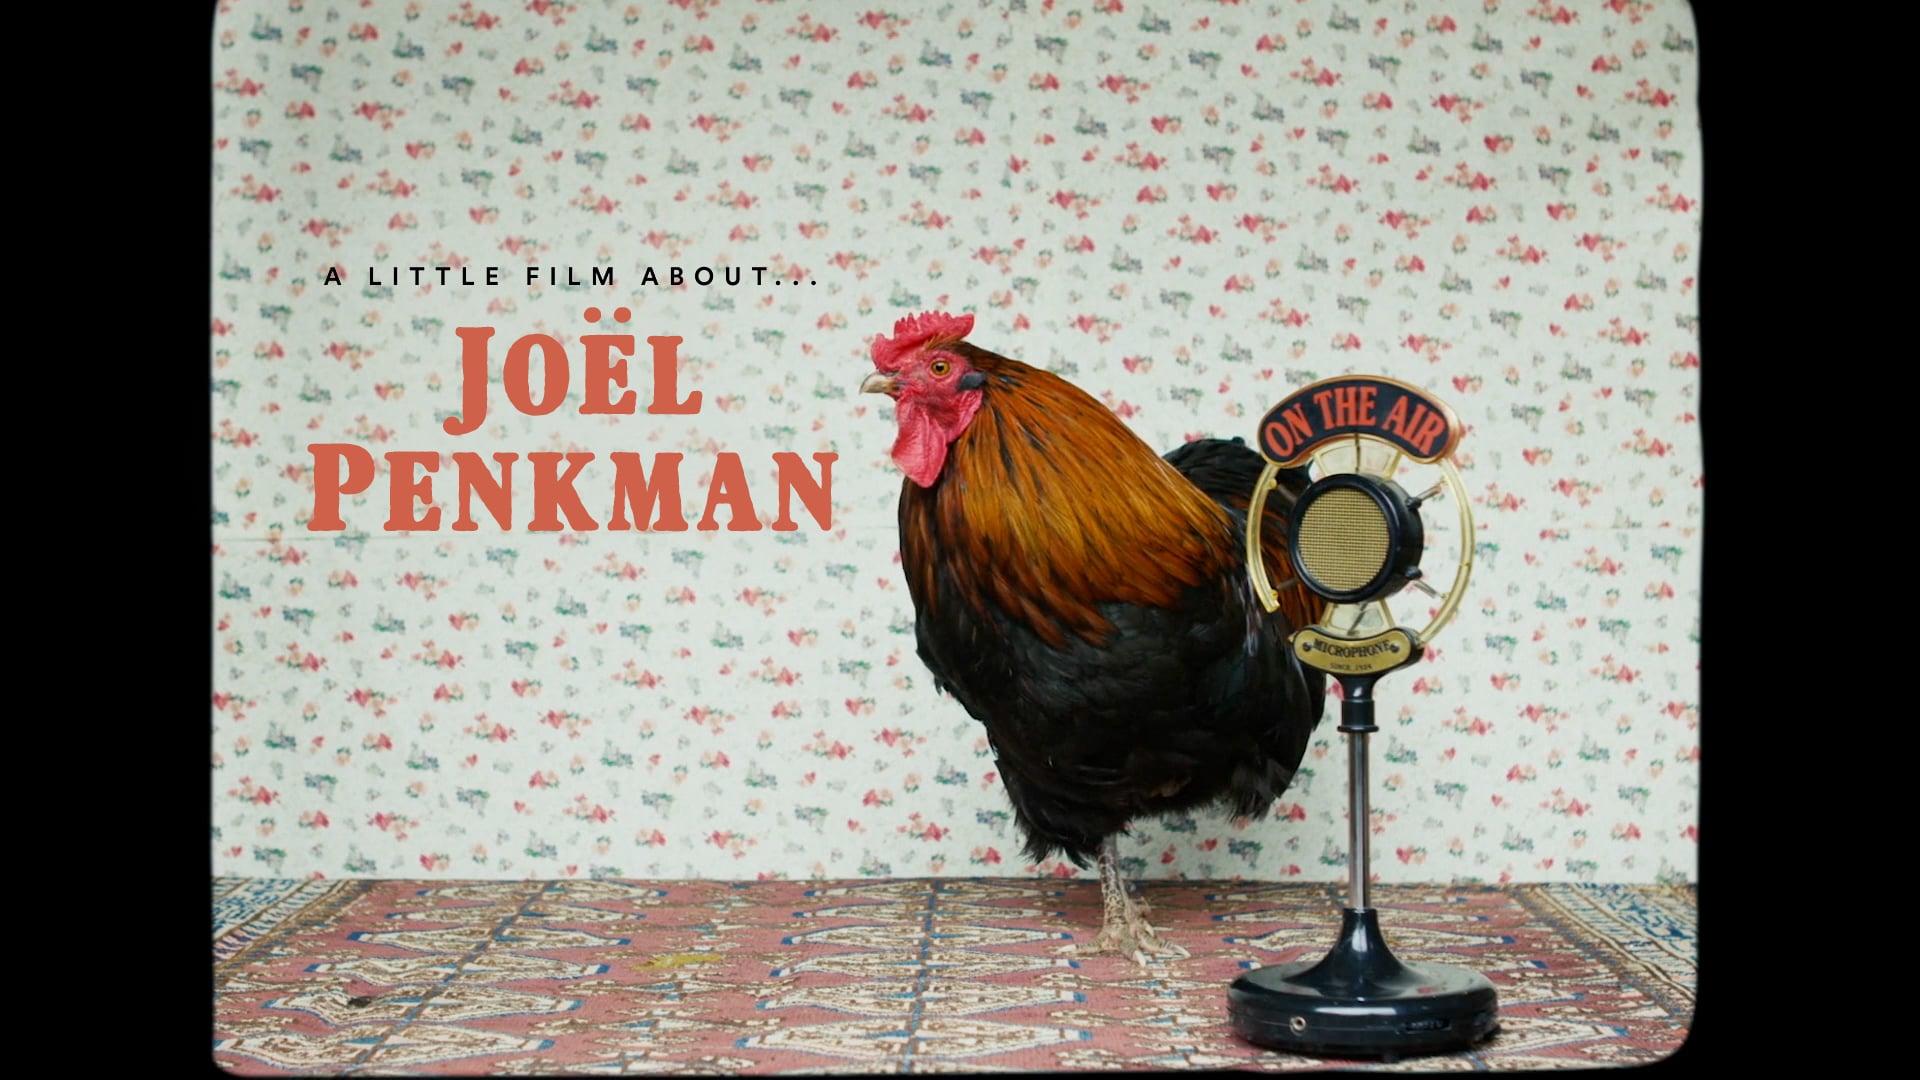 A Little Film About... Joël Penkman